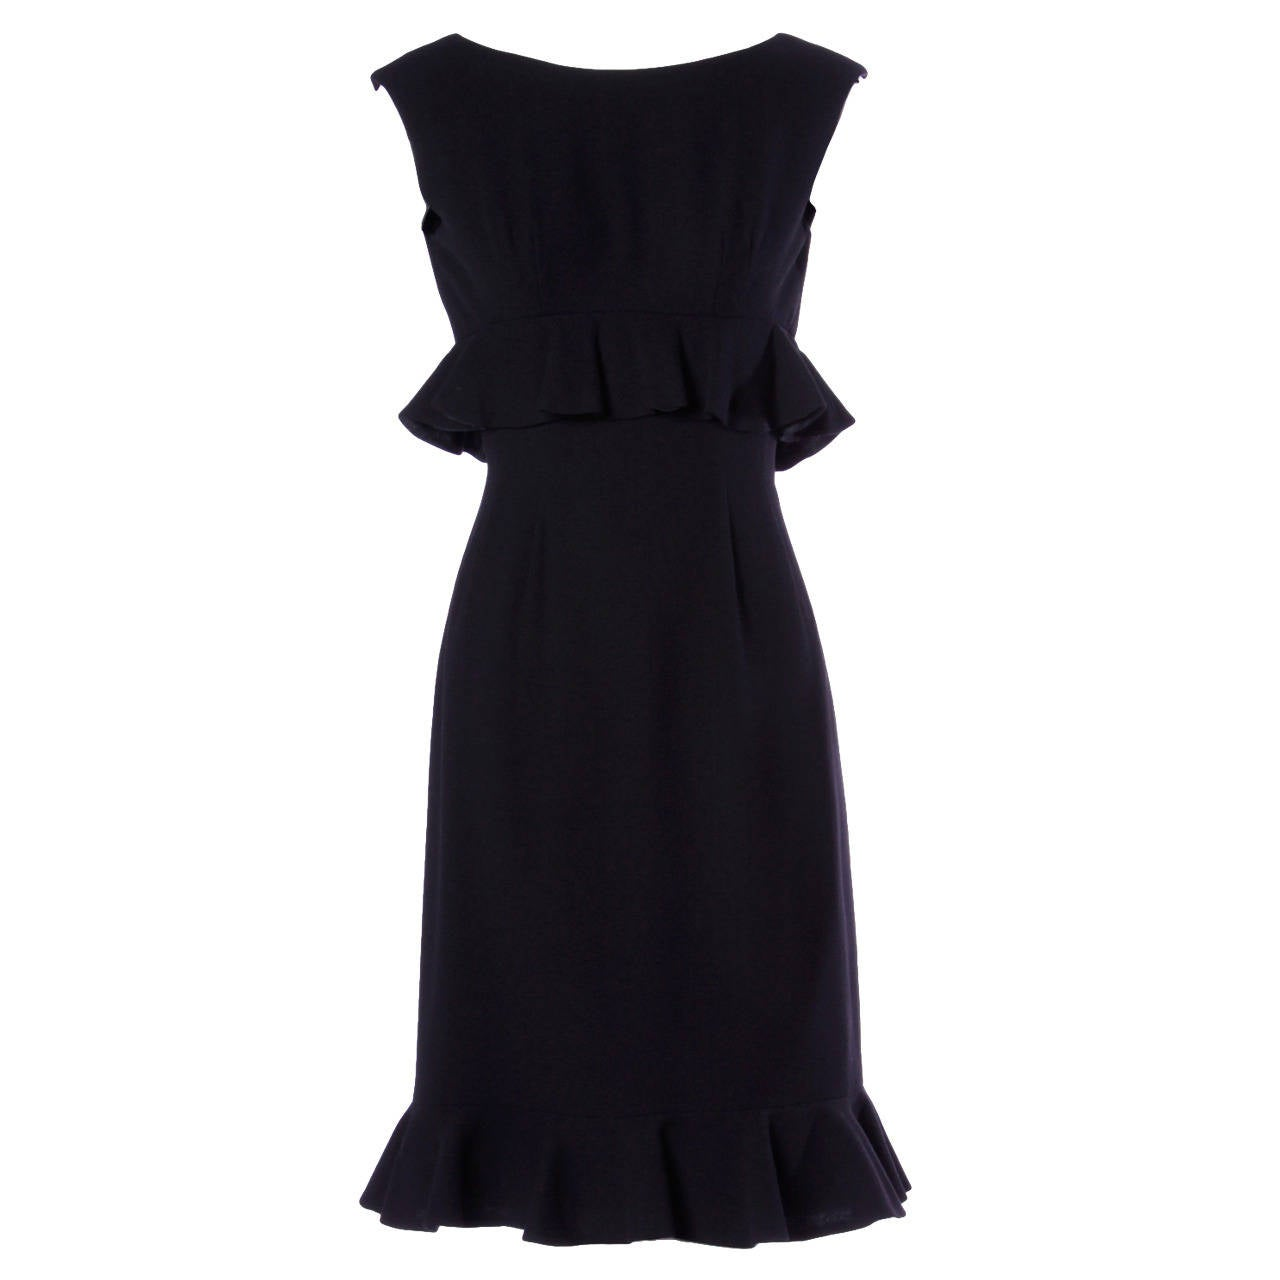 Wilson Folmar for Edward Abbott Vintage 1960s 60s Black Ruffle Cocktail Dress